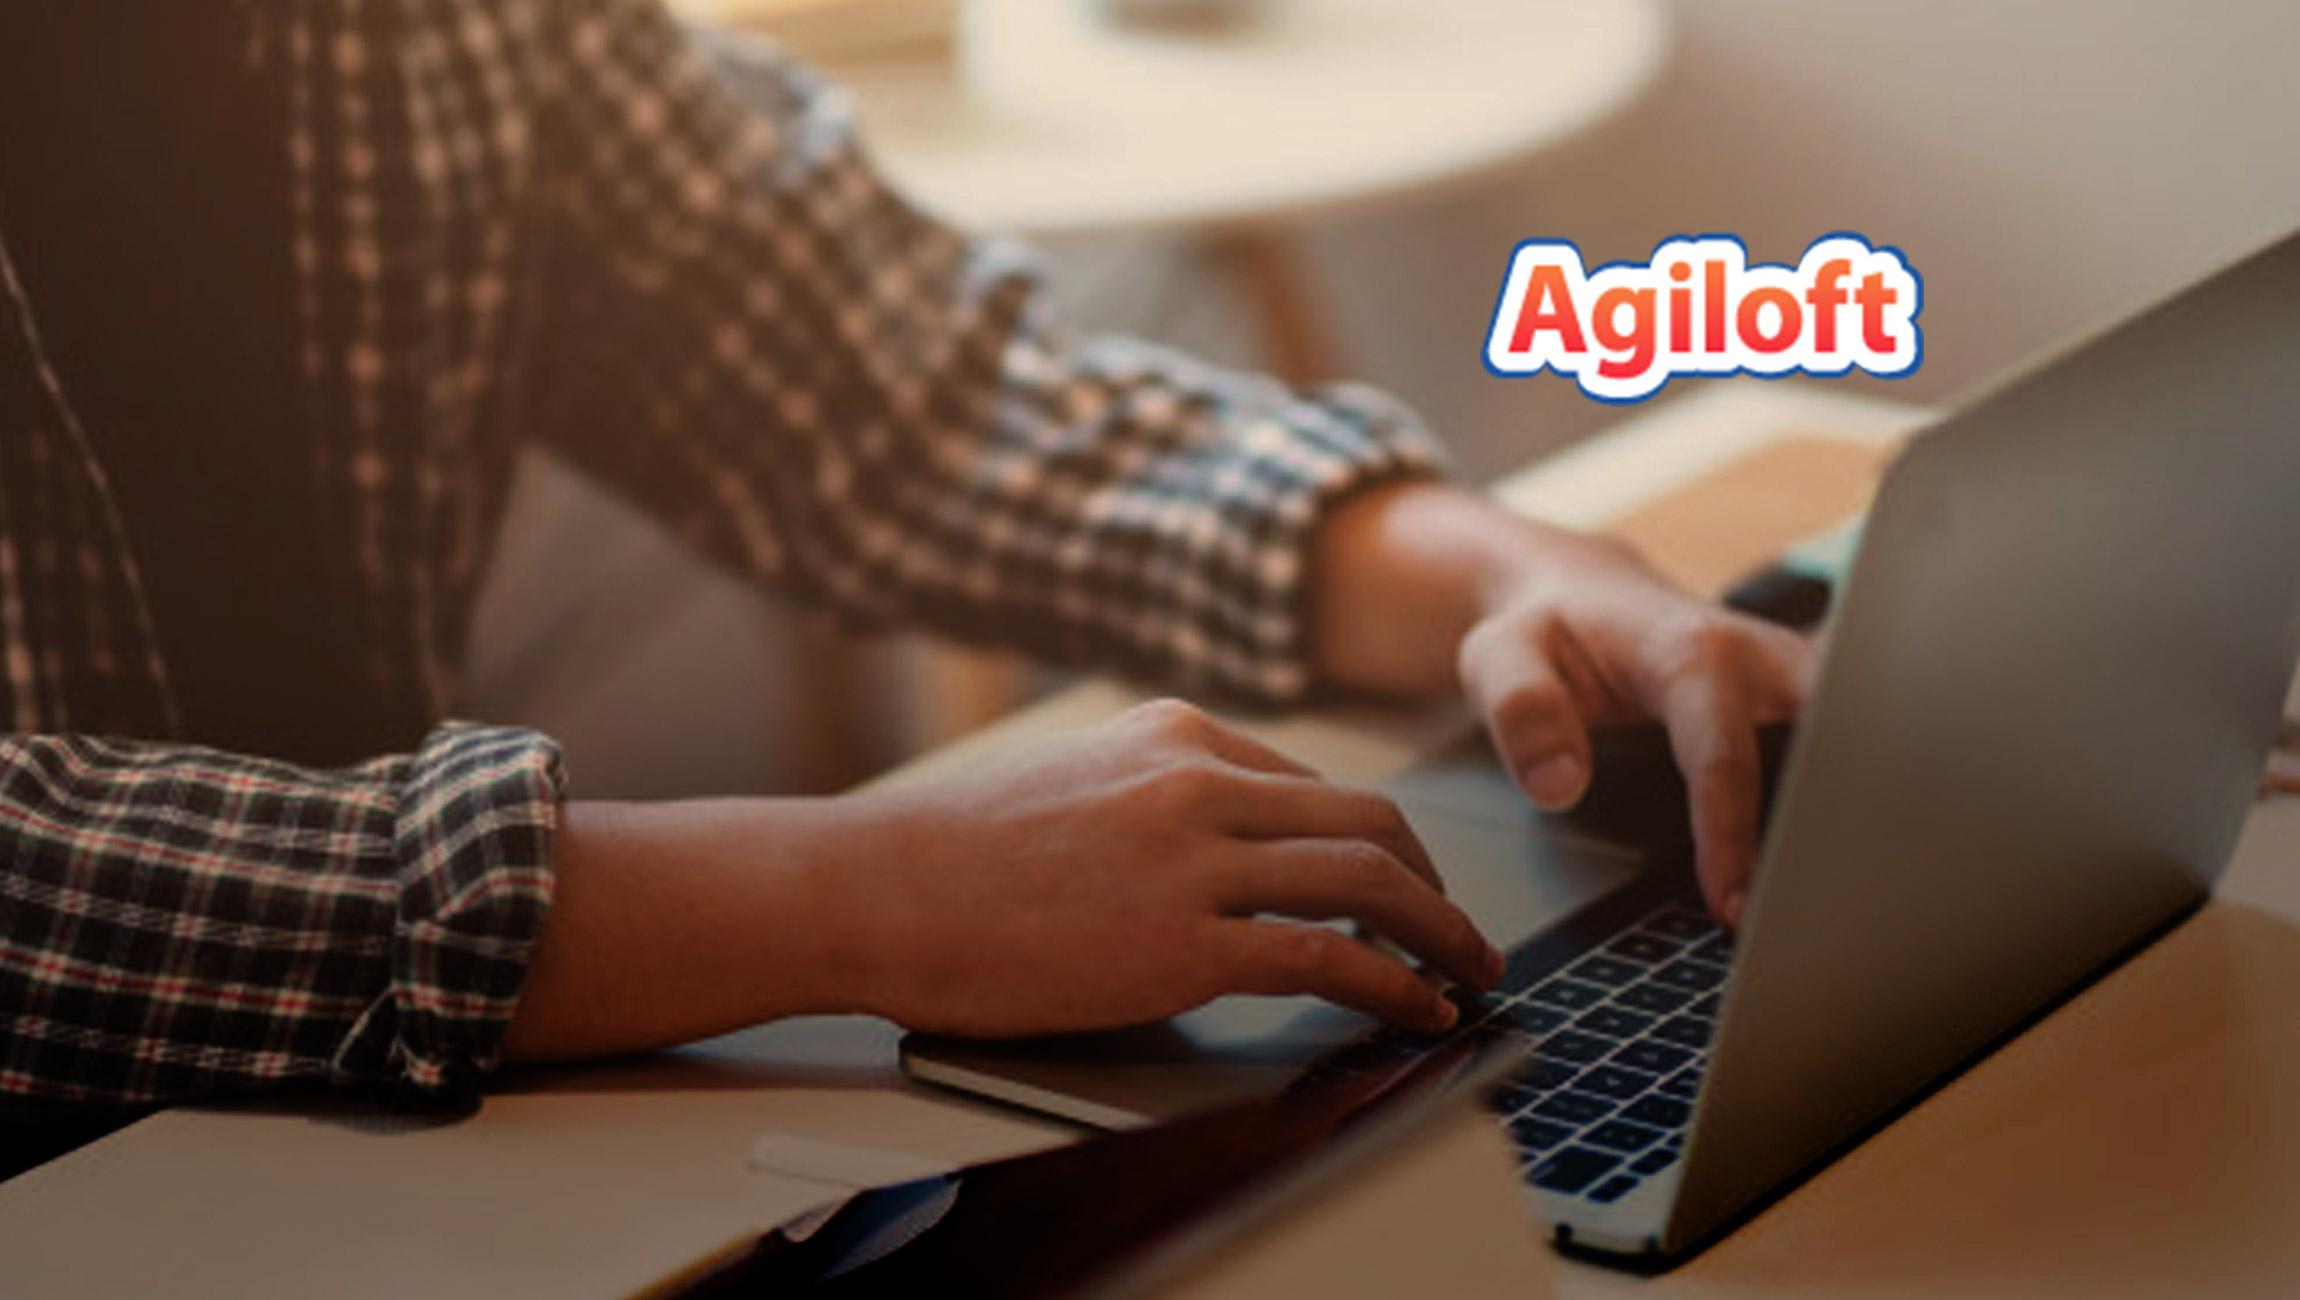 Boys Town Taps Agiloft to Automate Contract Management and Standardize Business Processes